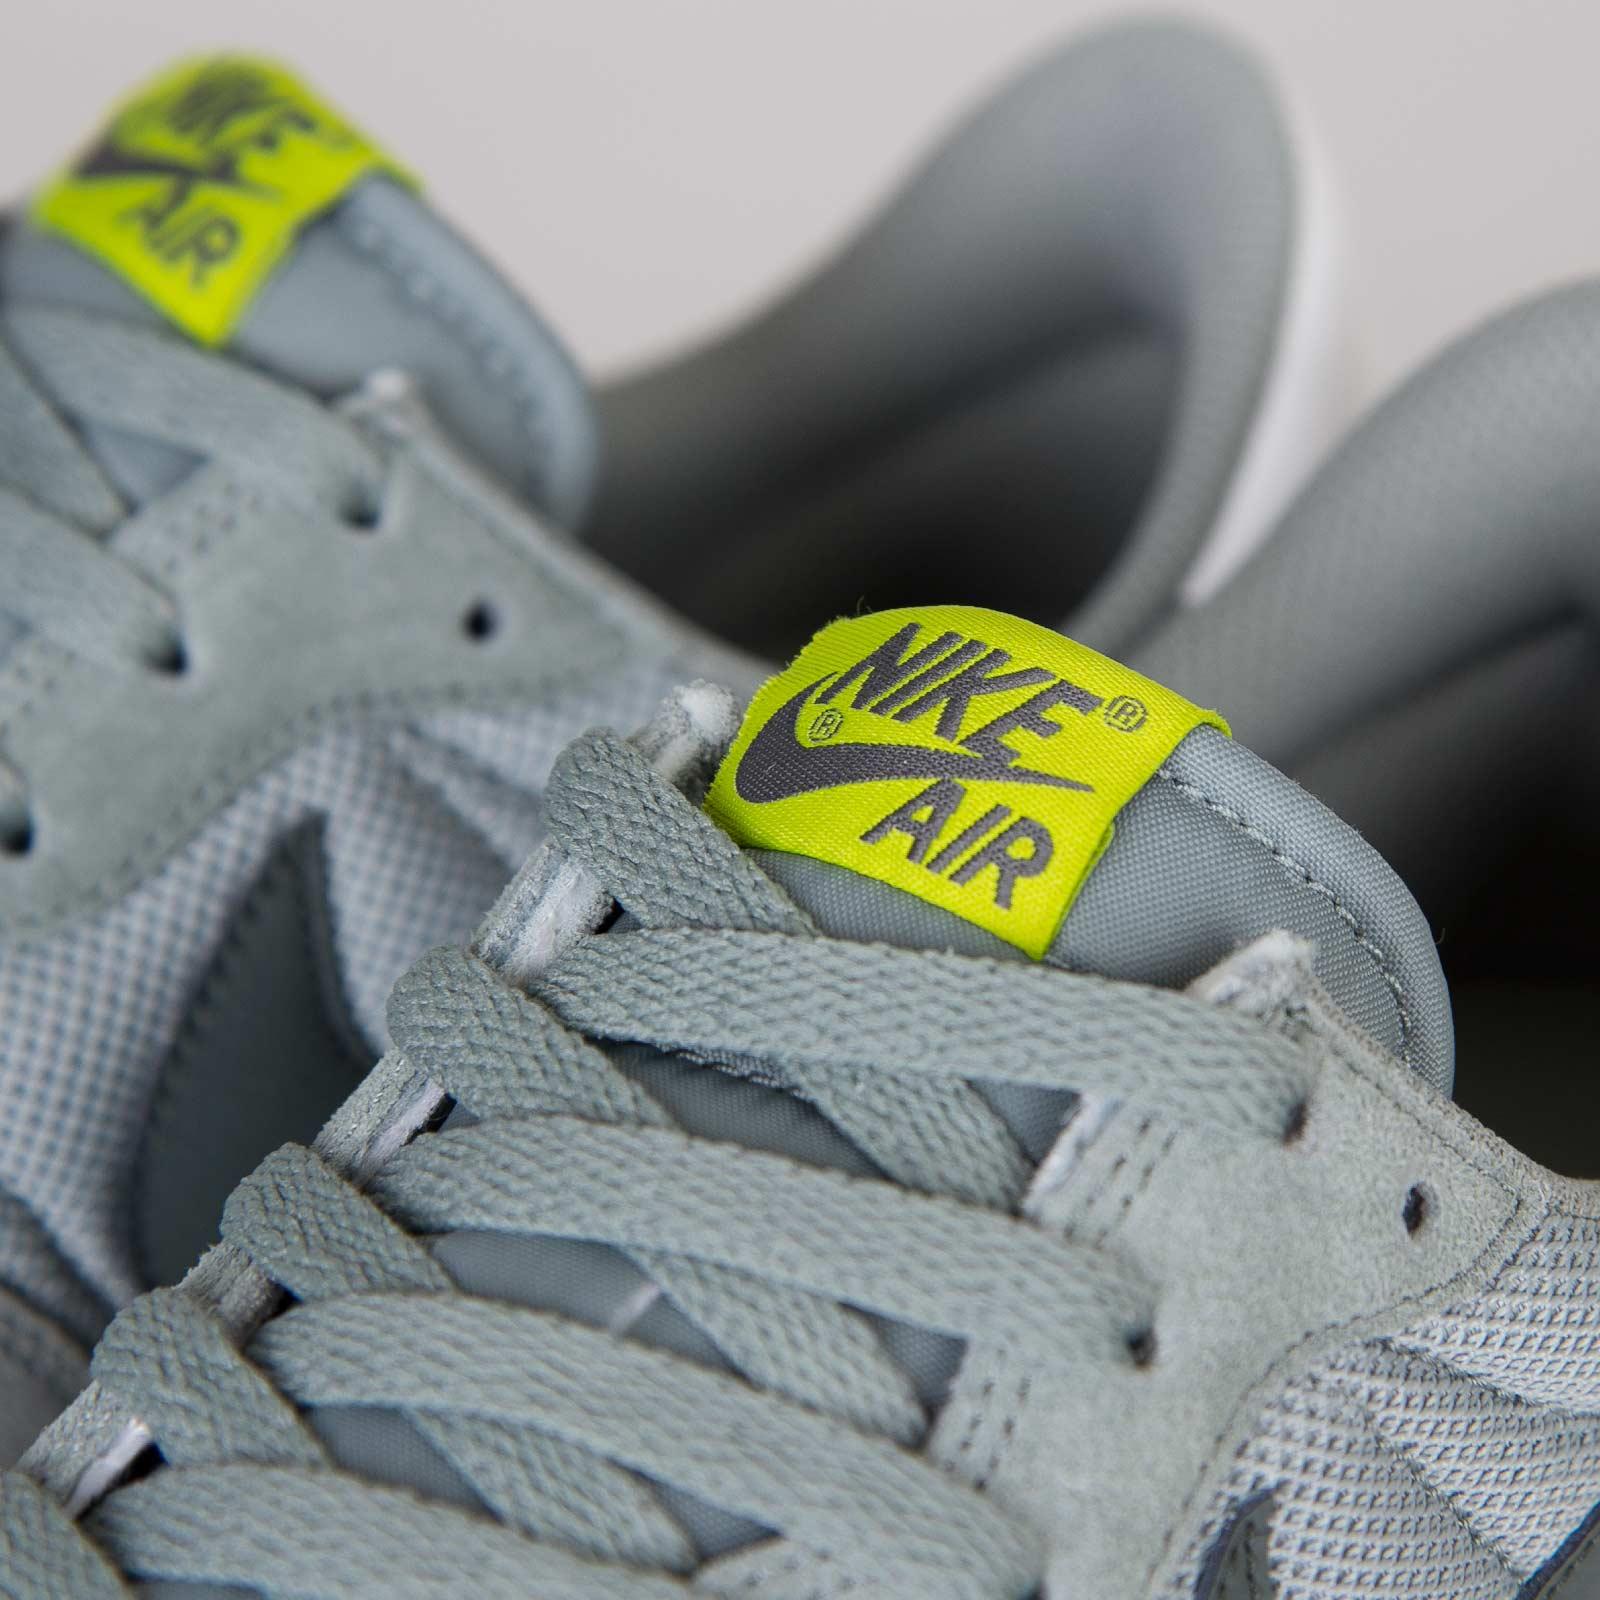 17ae39834f29 Nike Air Pegasus 83 - 599124-300 - Sneakersnstuff